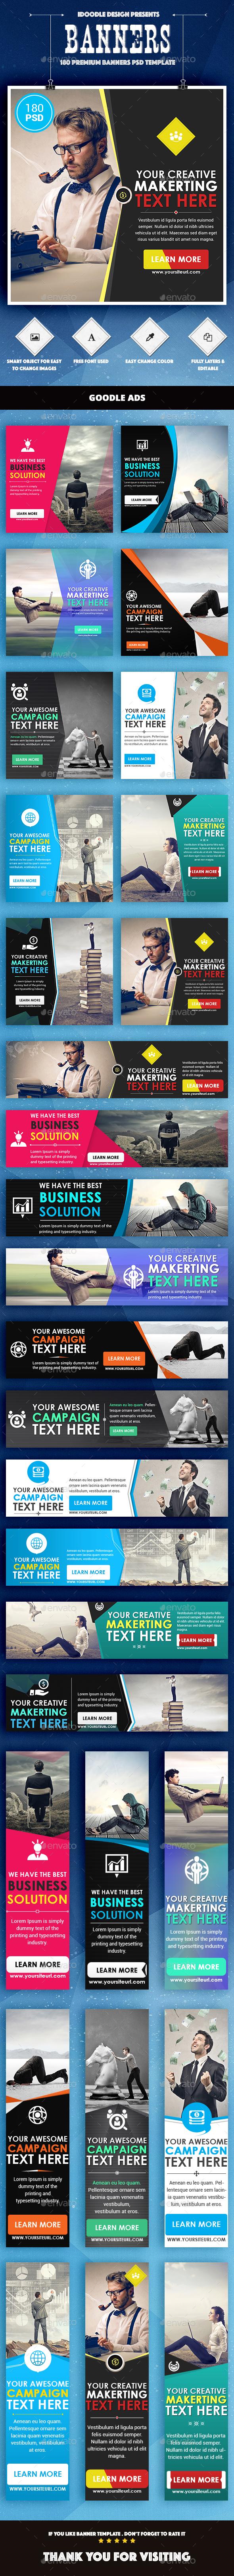 Bundle Multipurpose Banners Ads - 10 Sets - Banners & Ads Web Elements